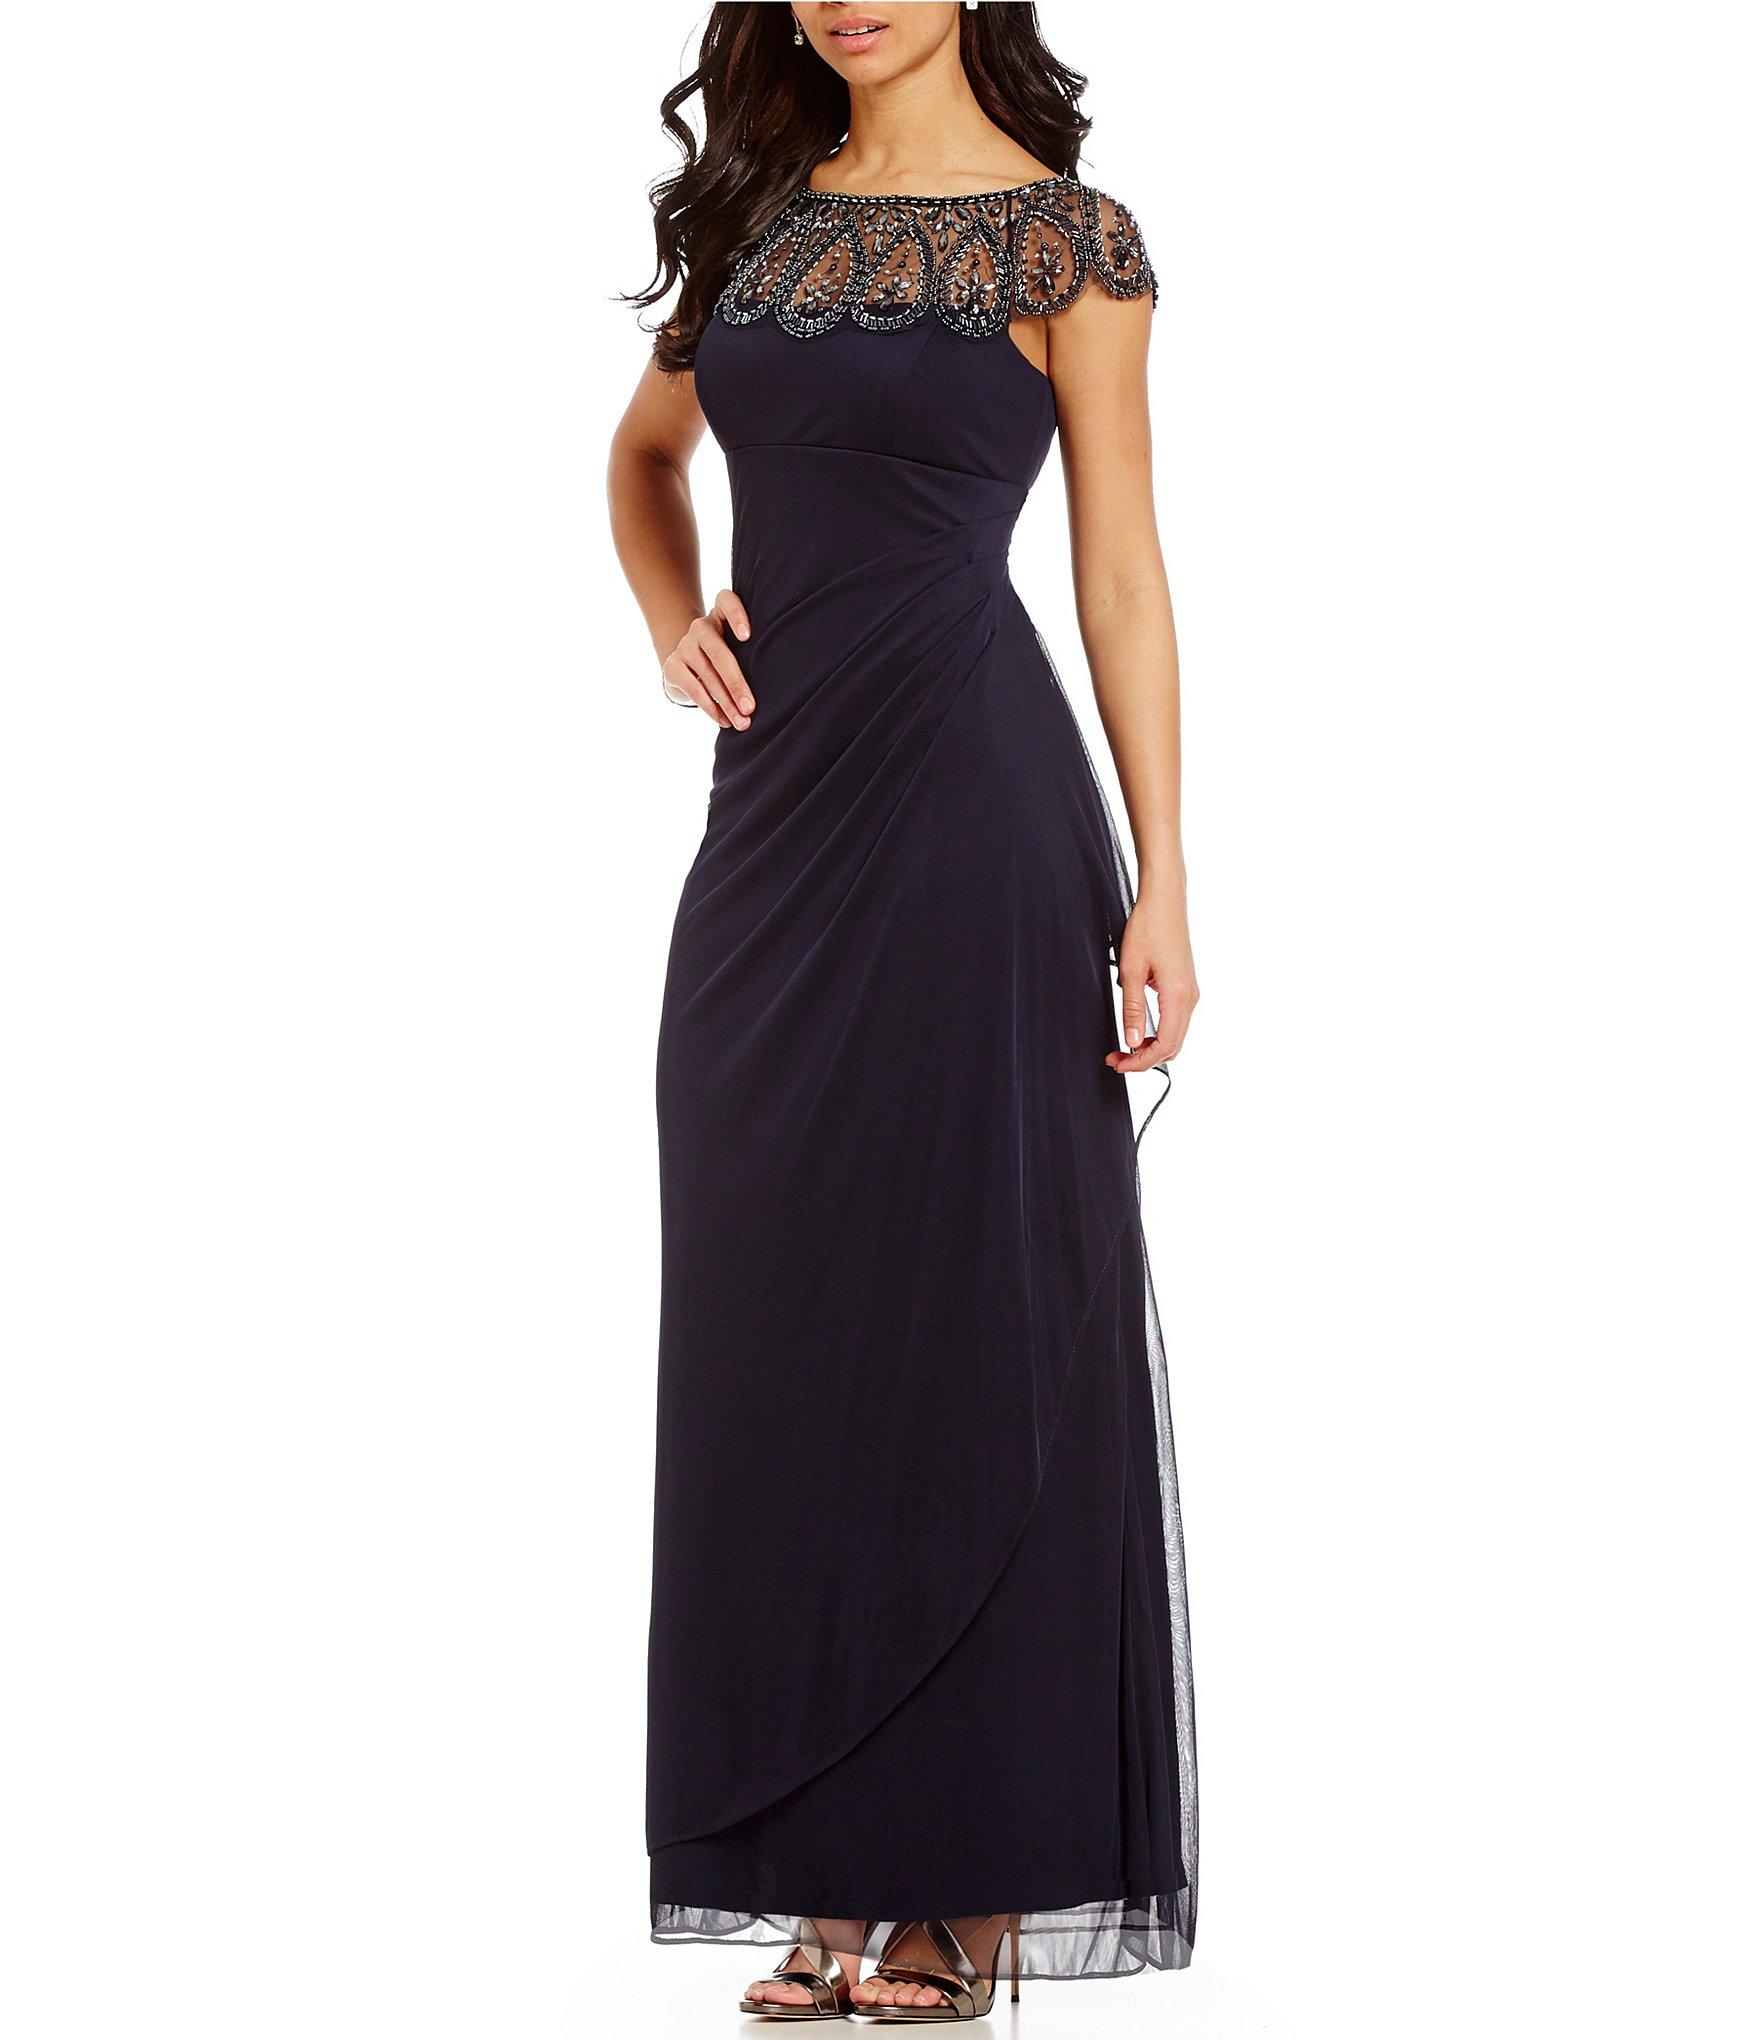 Xscape Women\'s Clothing | Dillards.com